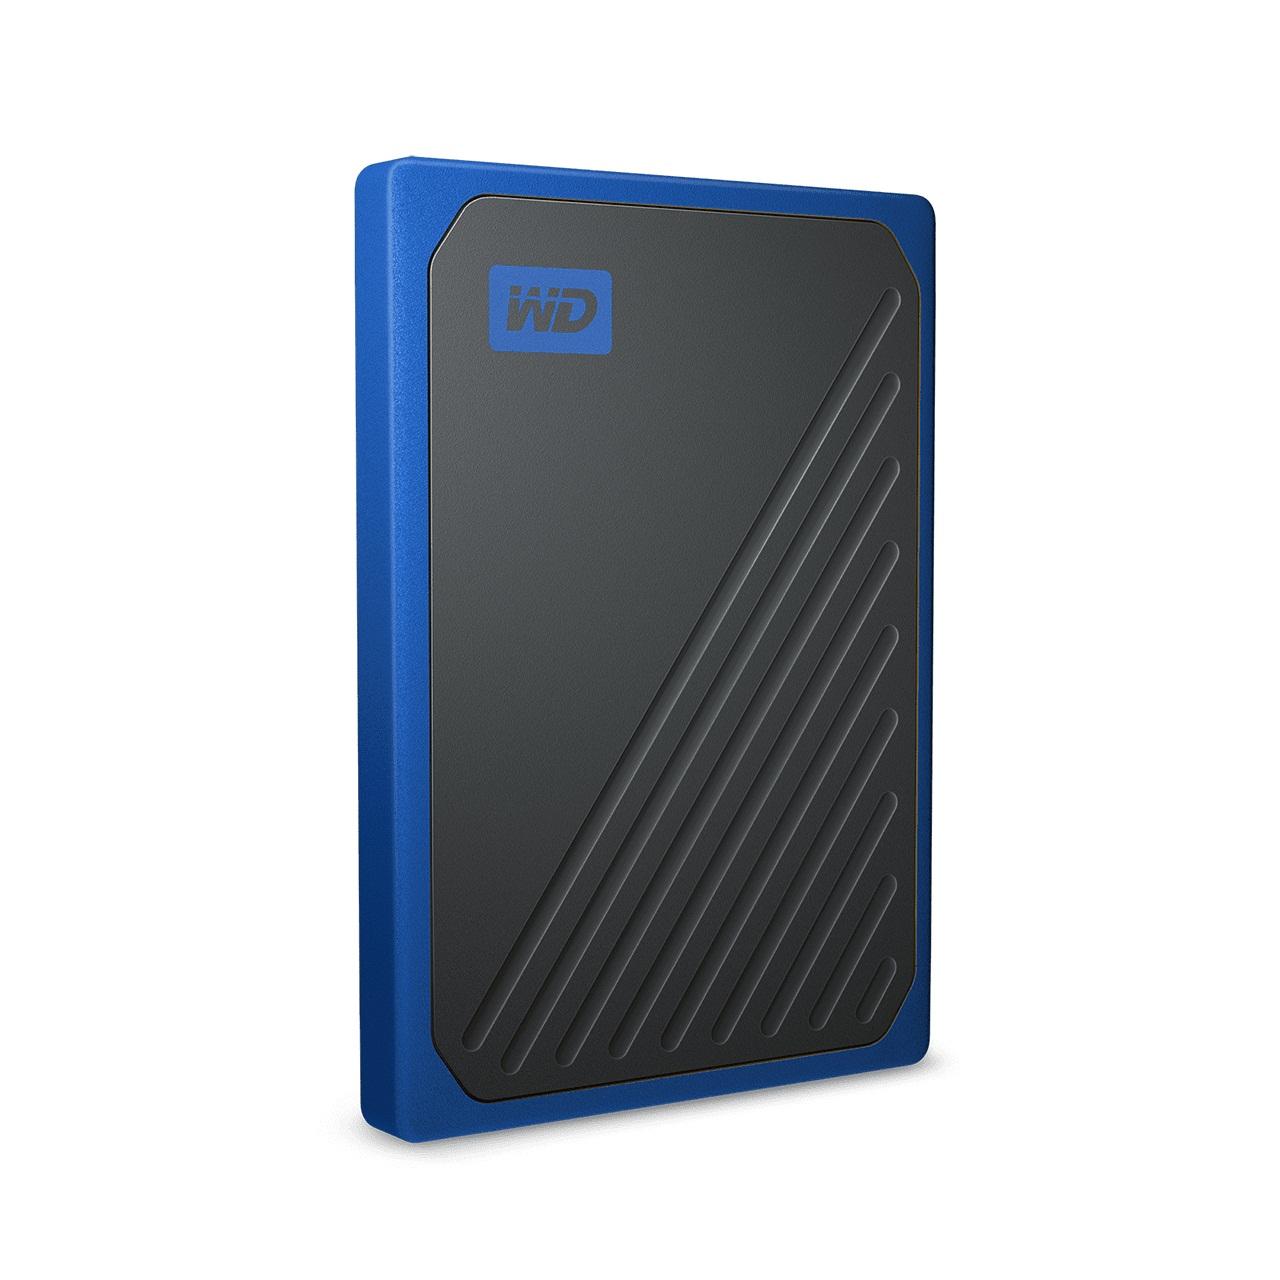 Western-Digital-WD-1TB-My-Passport-Go-Portable-External-SSD-Drive-All-Colour-VS thumbnail 7